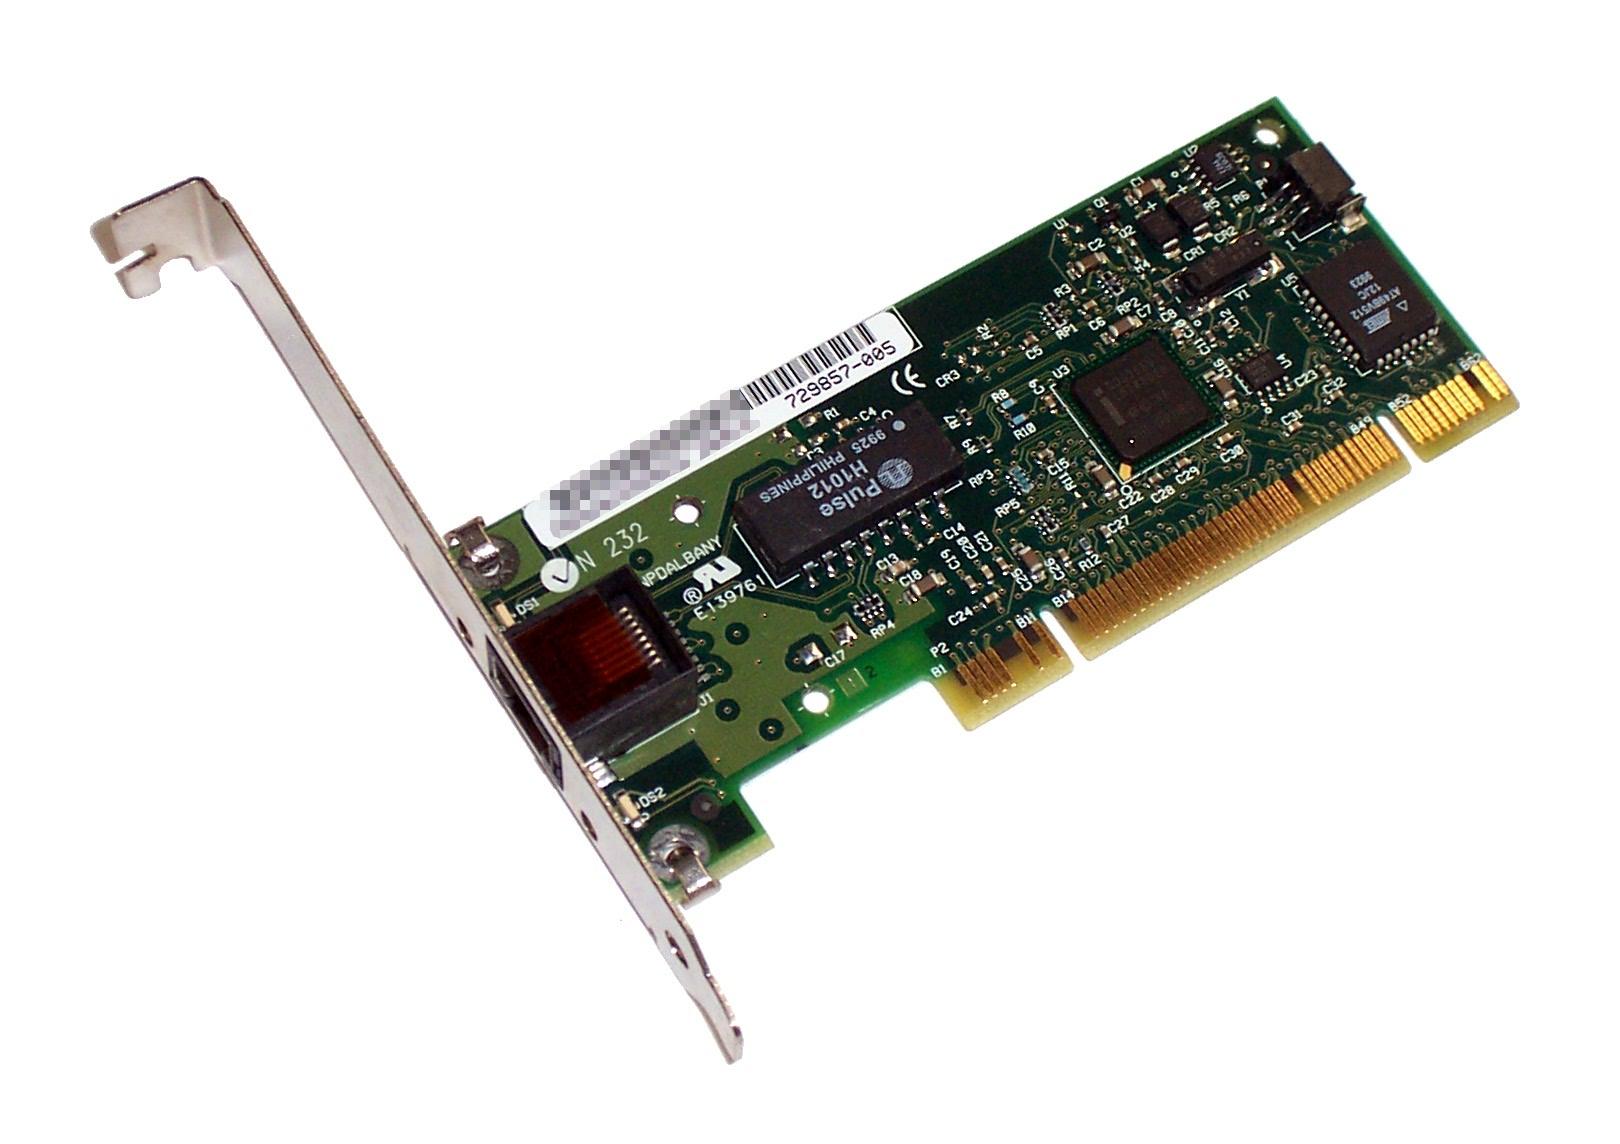 IBM 10100 ETHERJET PCI MANAGEMENT ADAPTER TREIBER WINDOWS 10